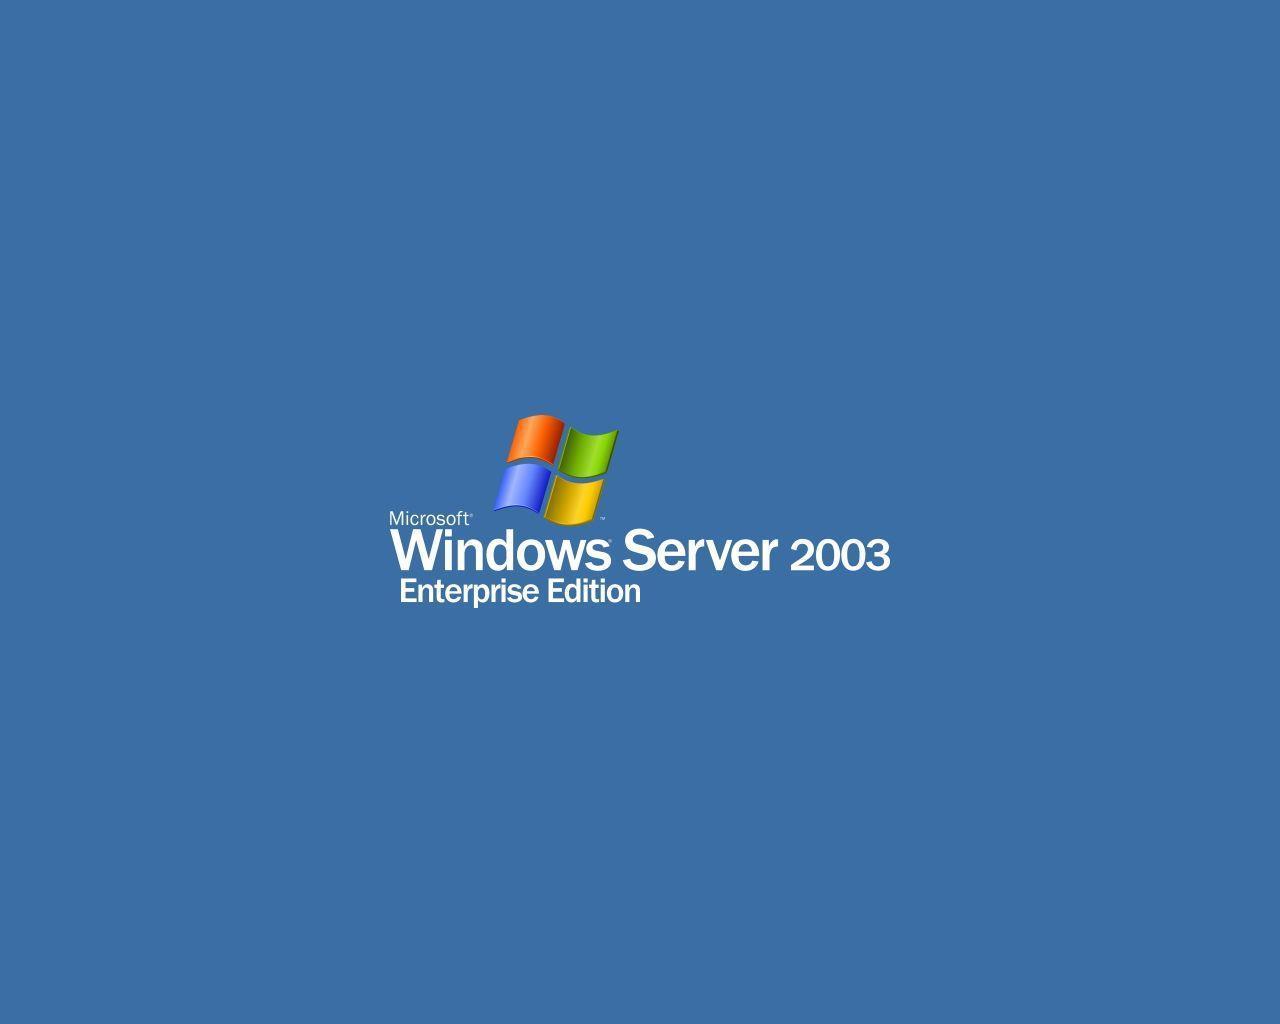 Windows Server 20 Wallpapers   Top Free Windows Server 20 ...